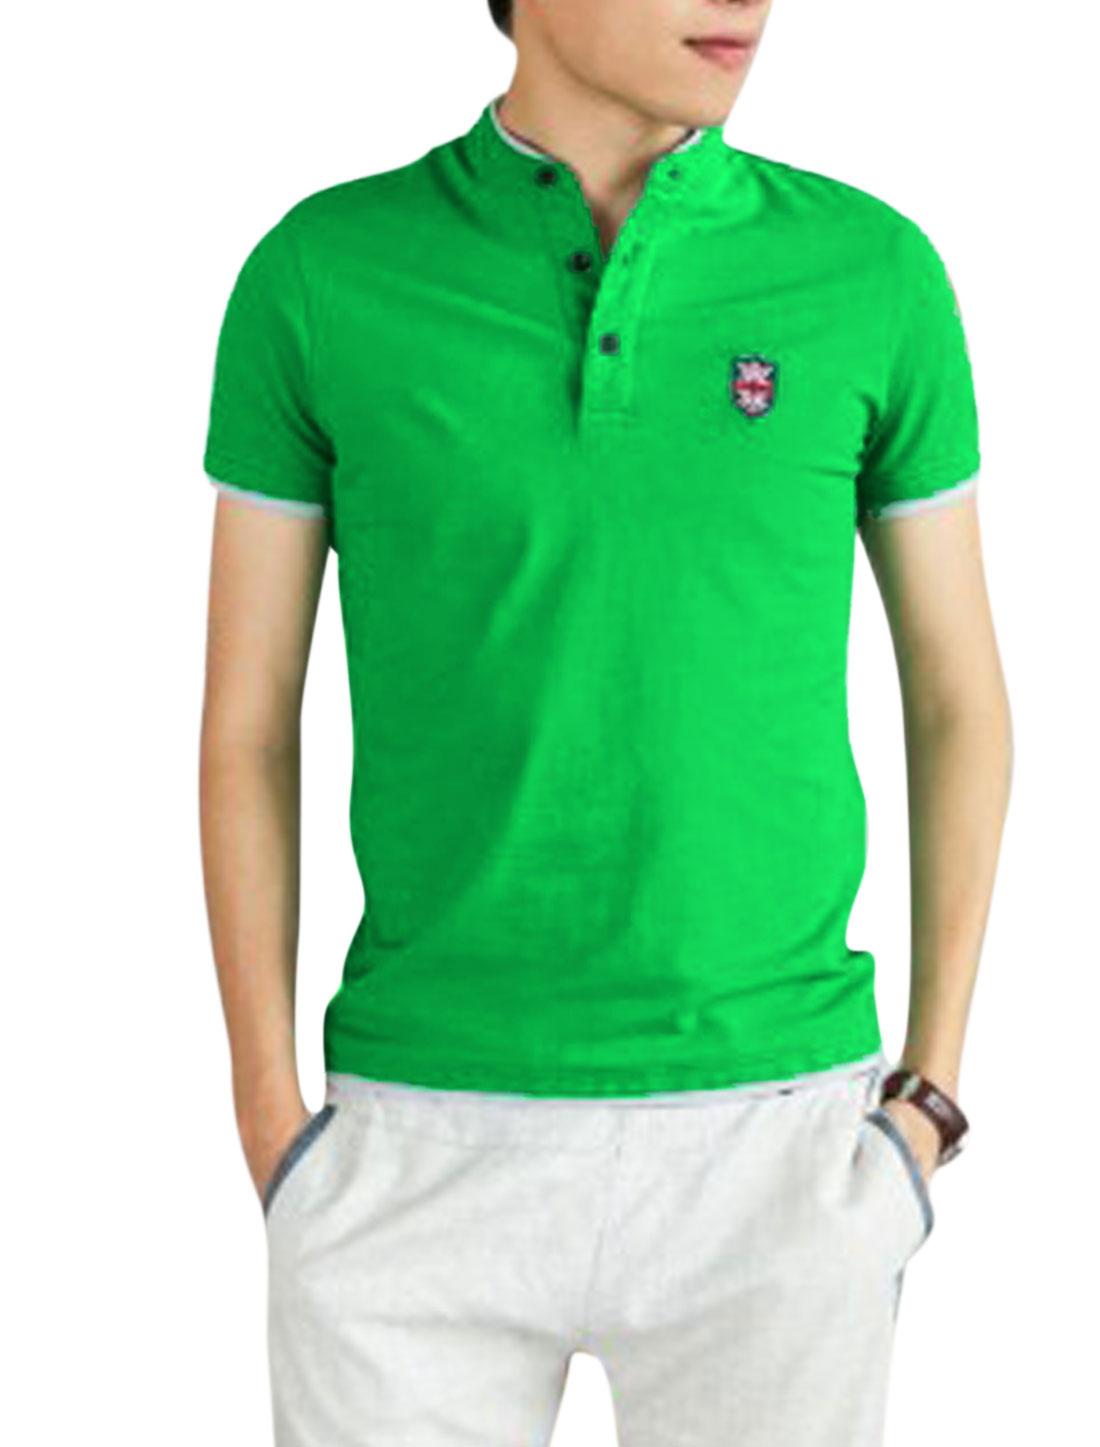 Men Stand Collar 1/4 Placket Layered Hem Trendy Polo Shirt Green M